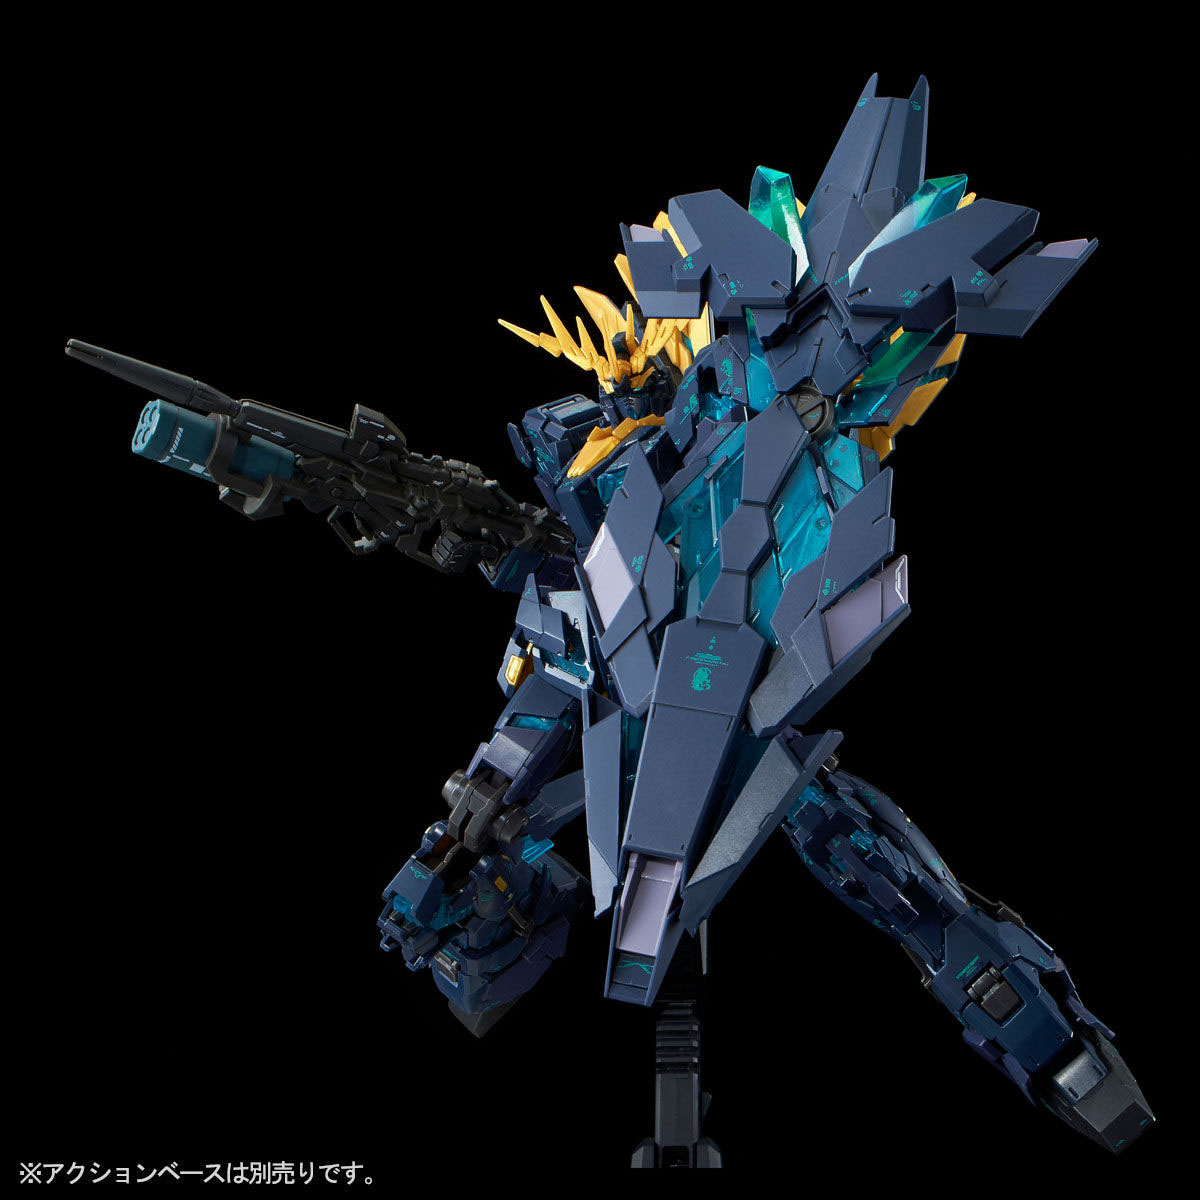 RG 1/144『ユニコーンガンダム2号機 バンシィ・ノルン(最終決戦仕様)』プラモデル-006